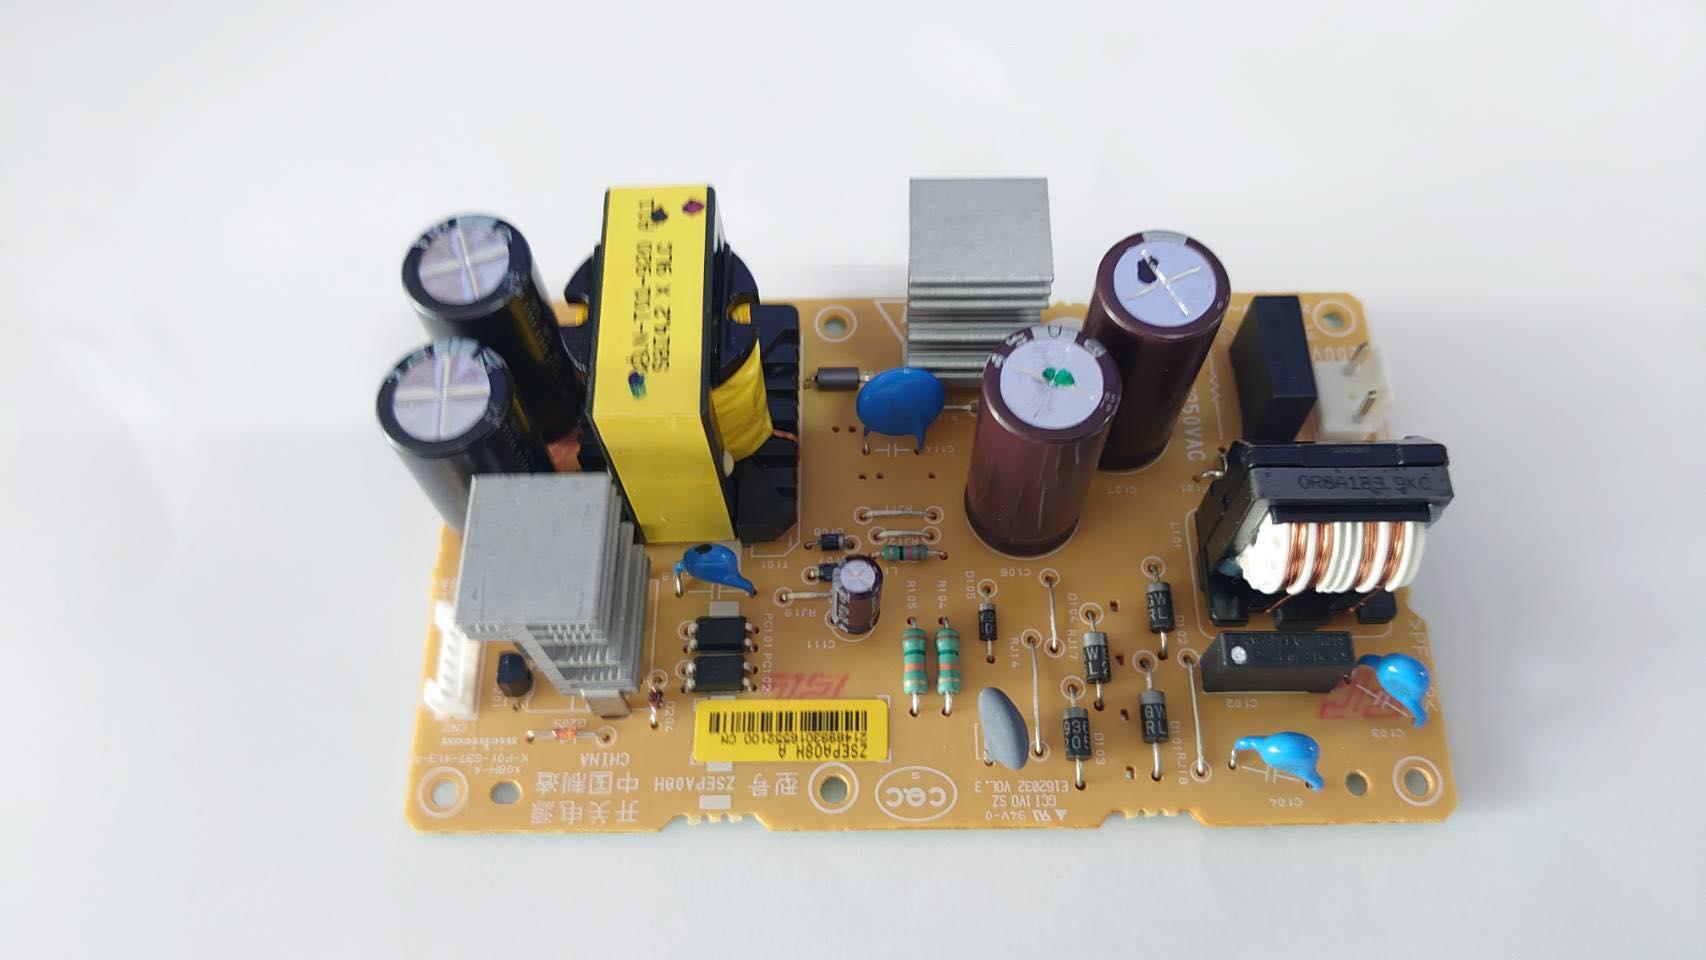 POWER SUPPLY EPSON LQ310 (NEW)